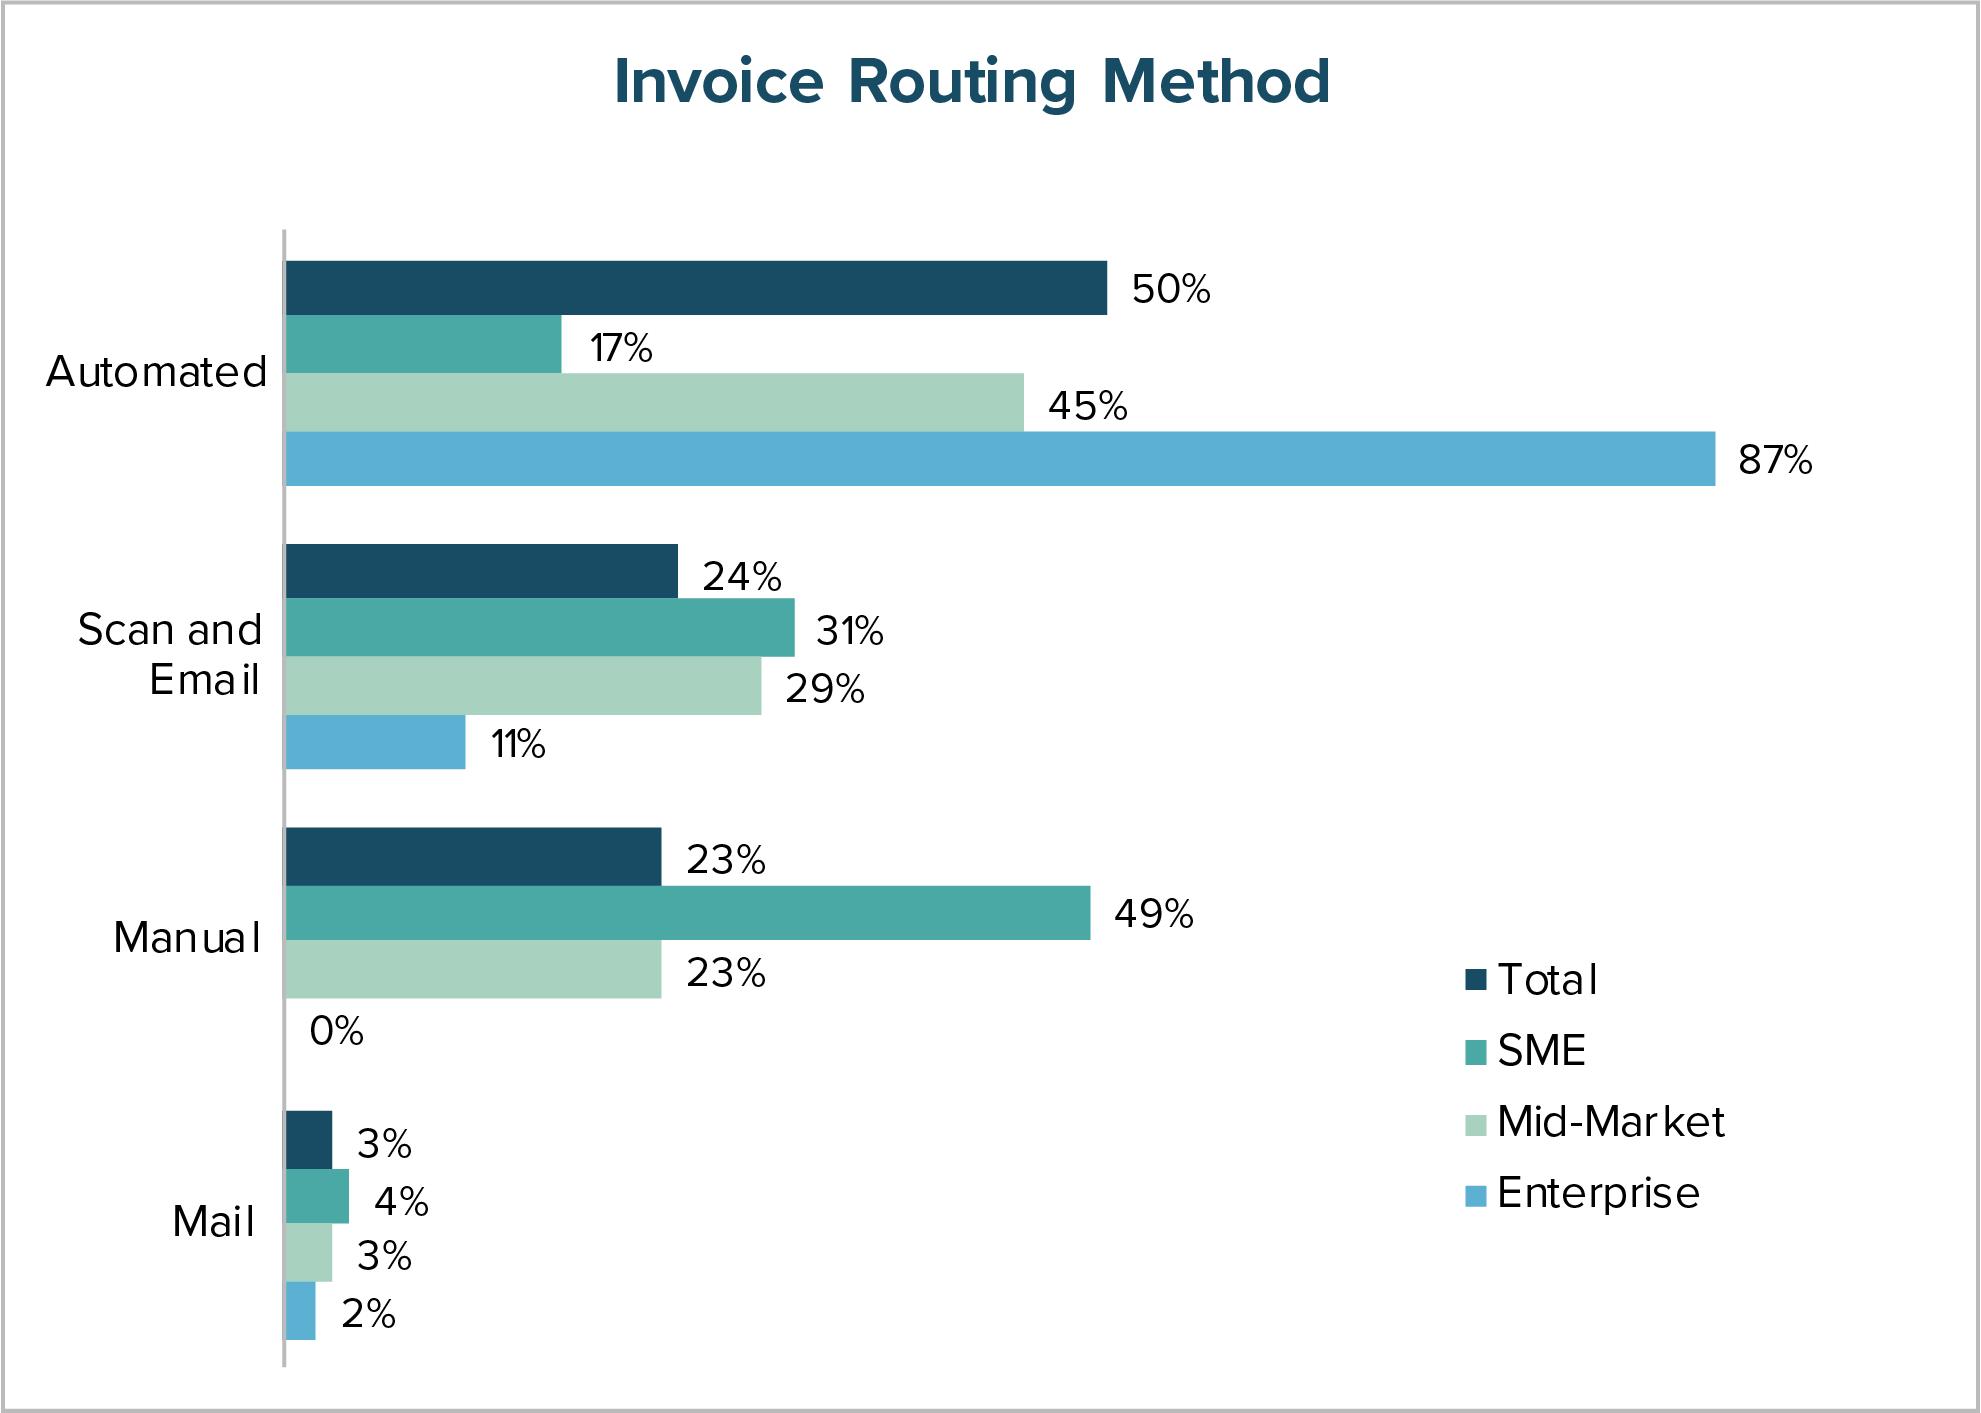 Invoice Routing Method